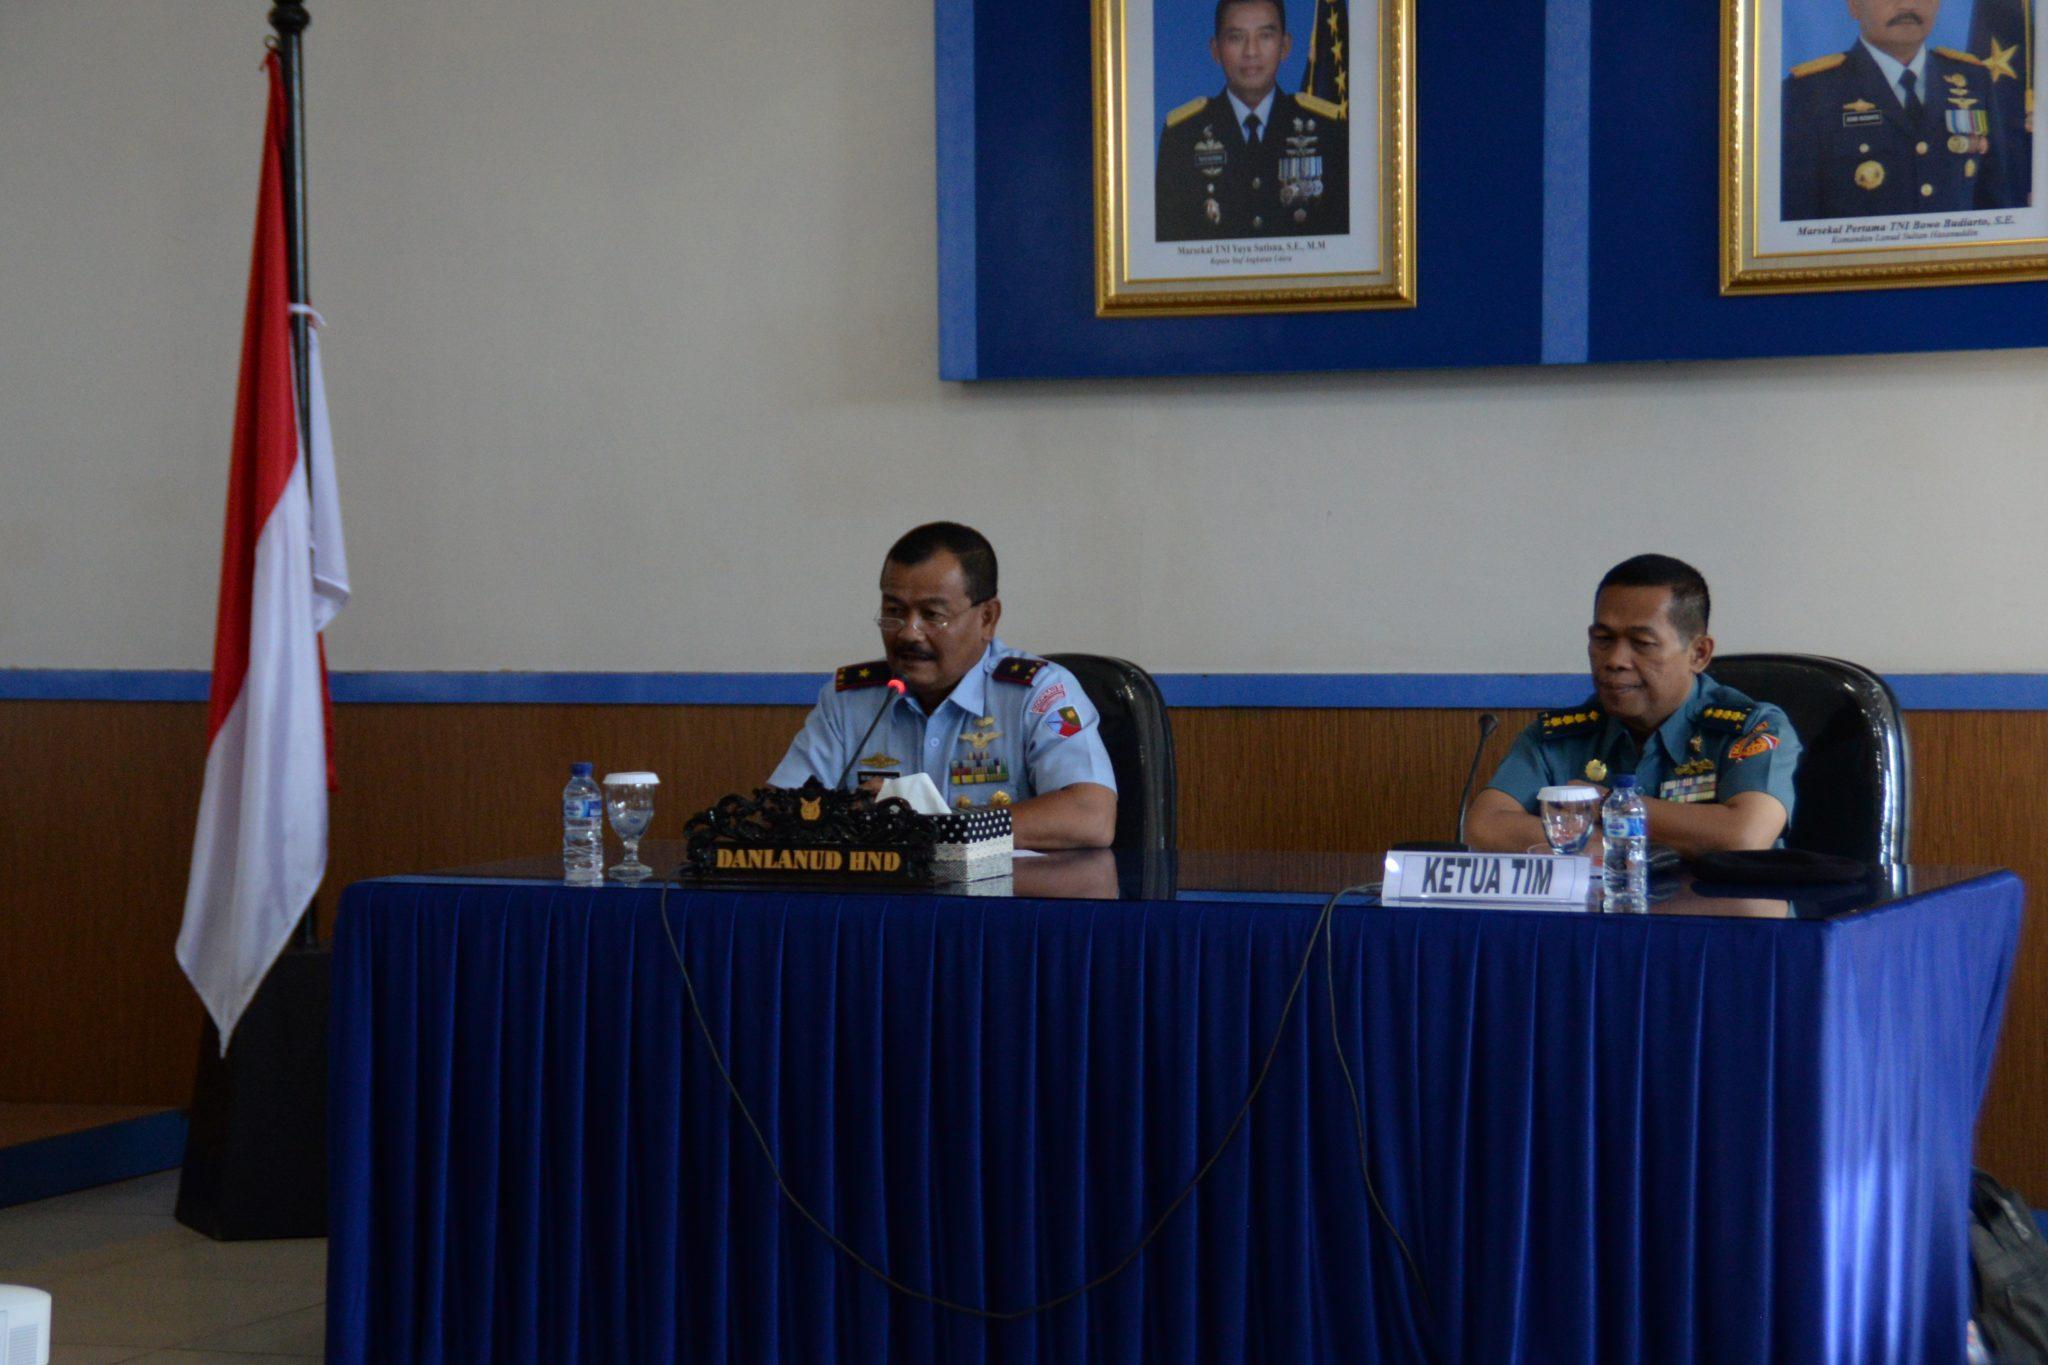 Penerimaan Wasrik Itjen TNI di Lanud Sultan Hasanuddin